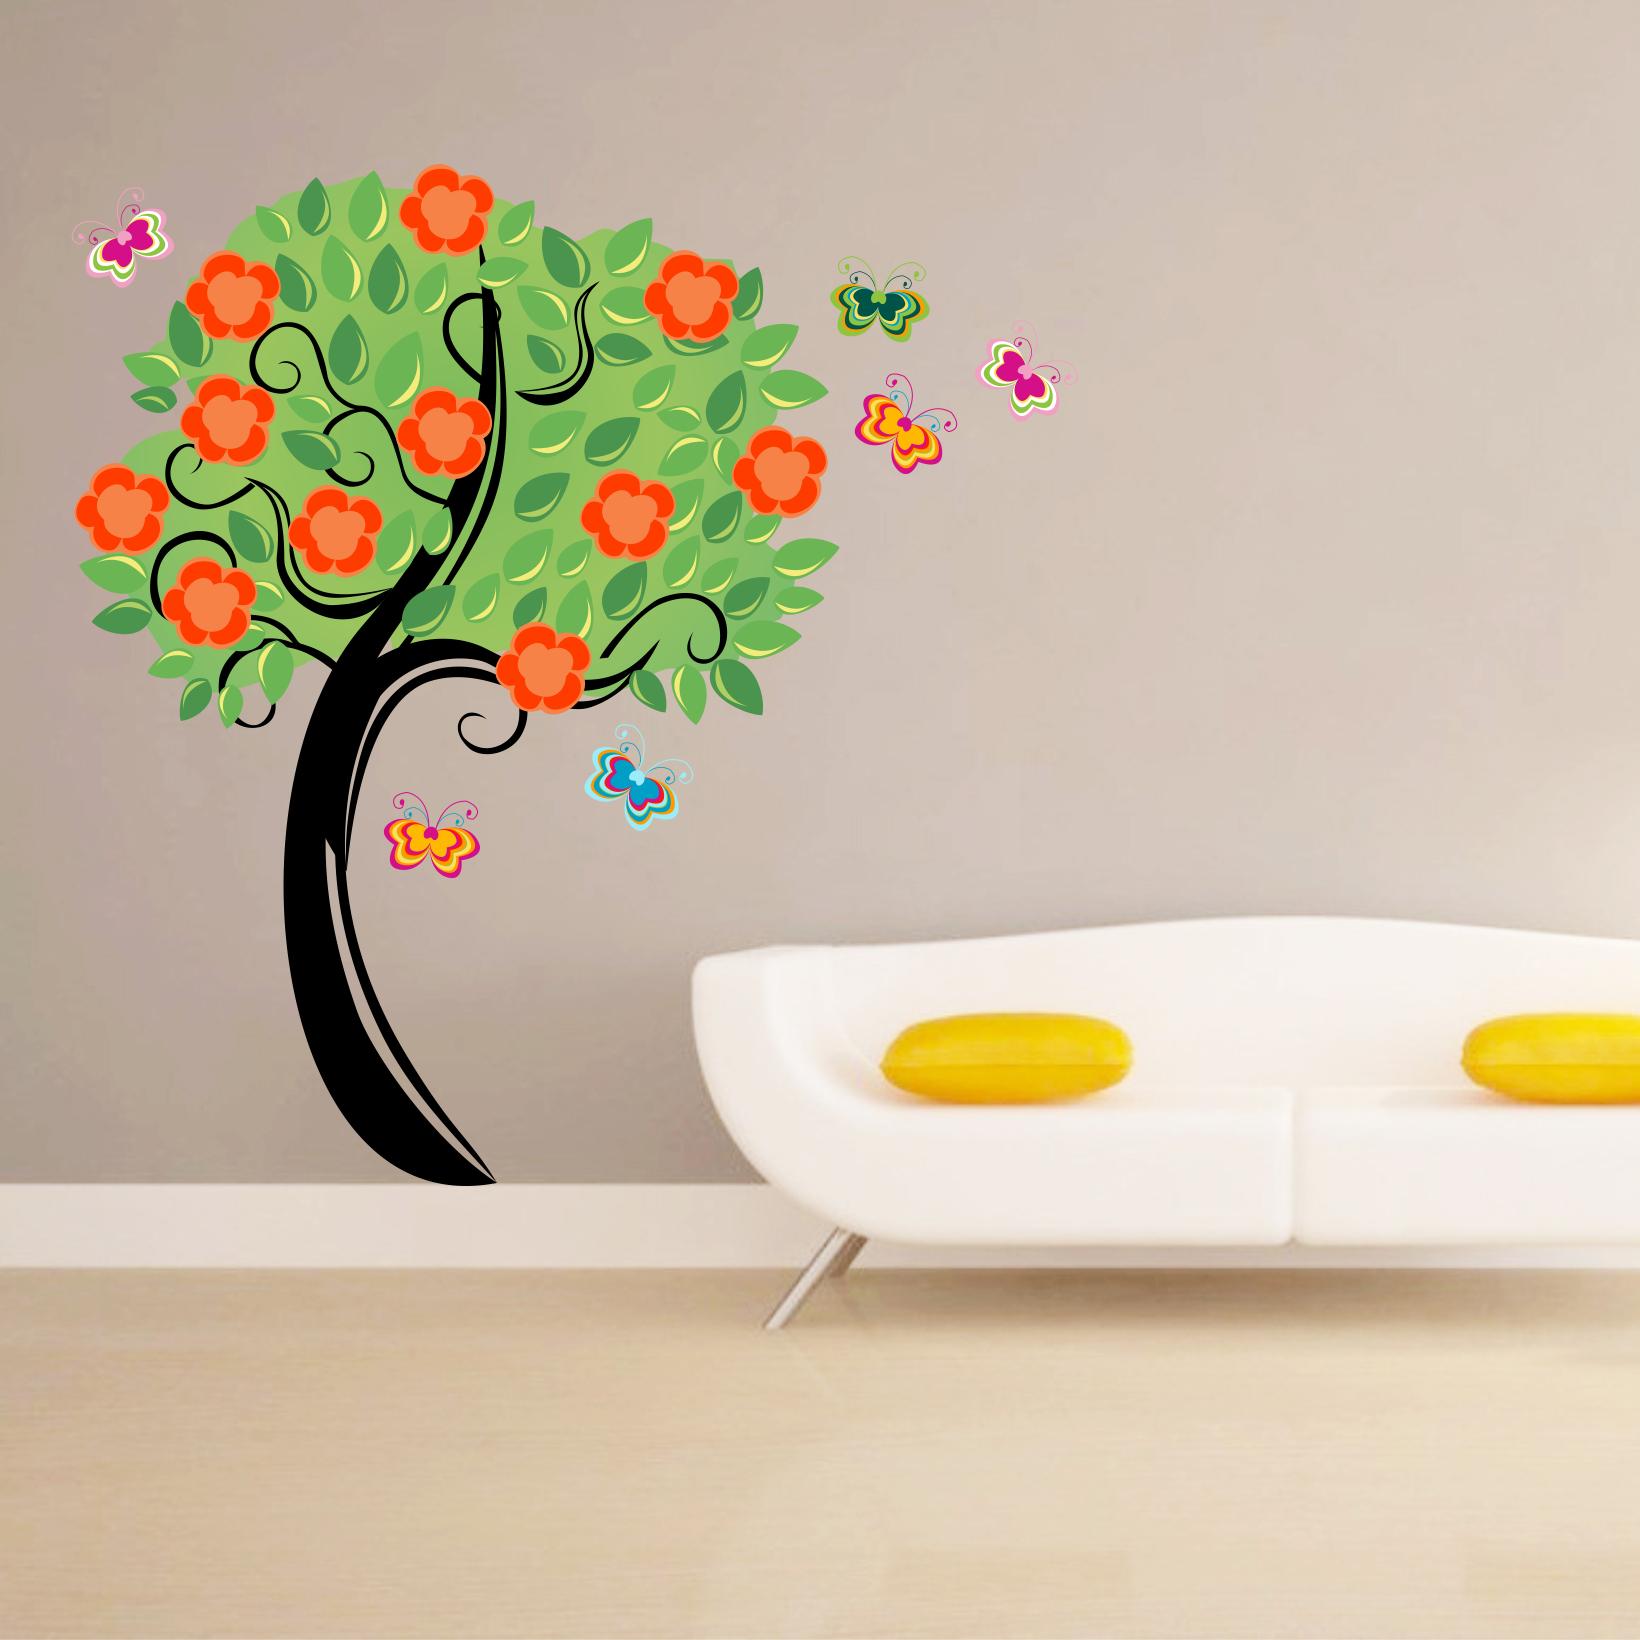 Stickere perete copii Copacul vesel - 131 x 150 cm imagine